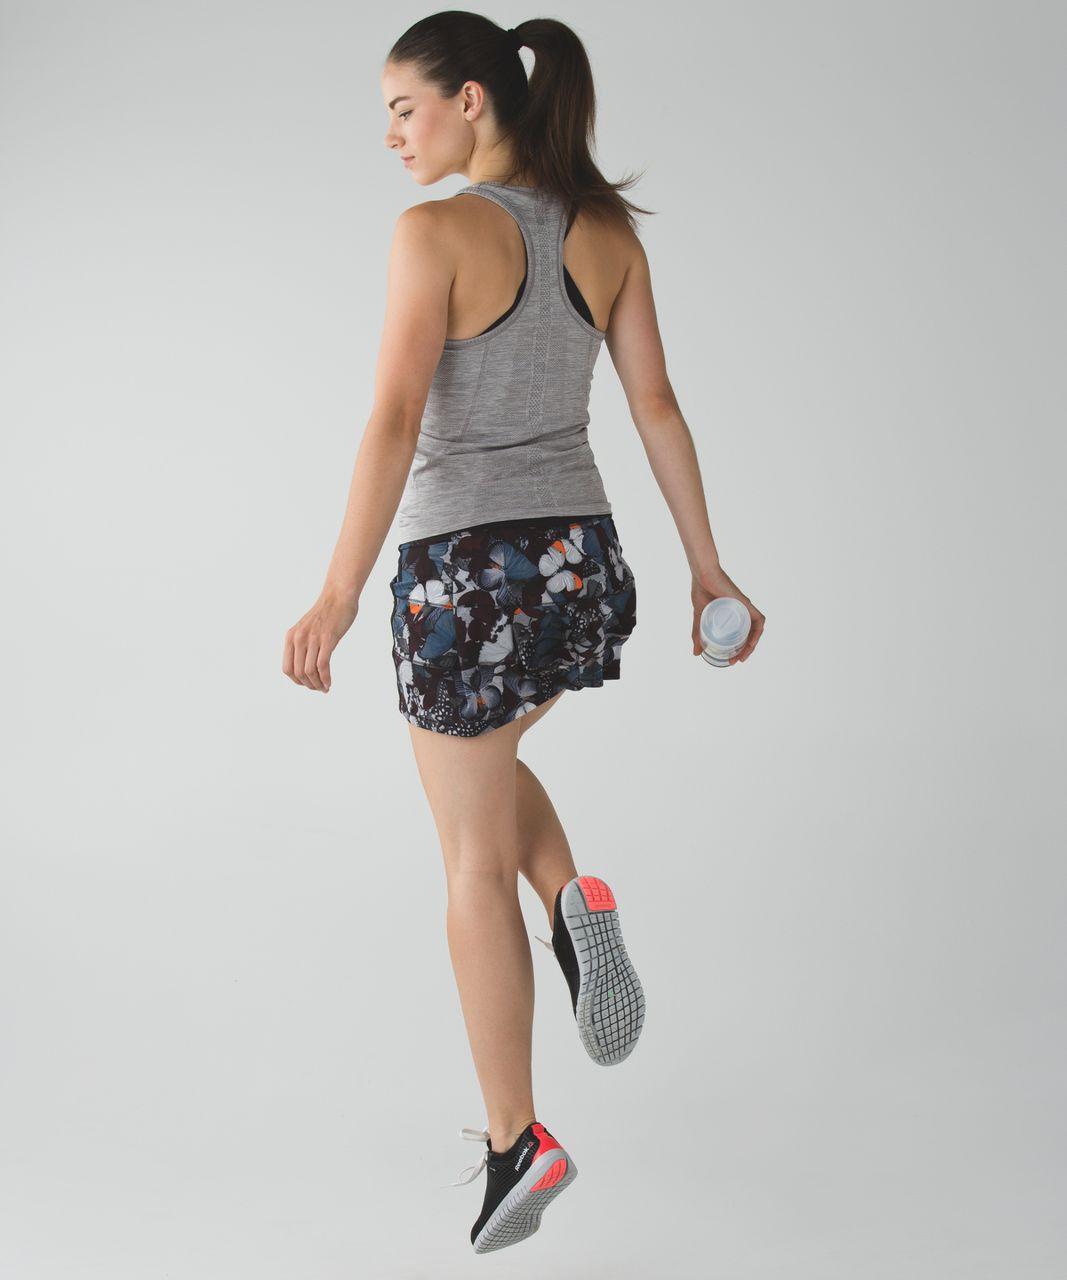 Lululemon Pace Rival Skirt II *4-way Stretch (Regular) - Biggie So Fly Butterfly Pizzaz Multi / Black / Pizzaz